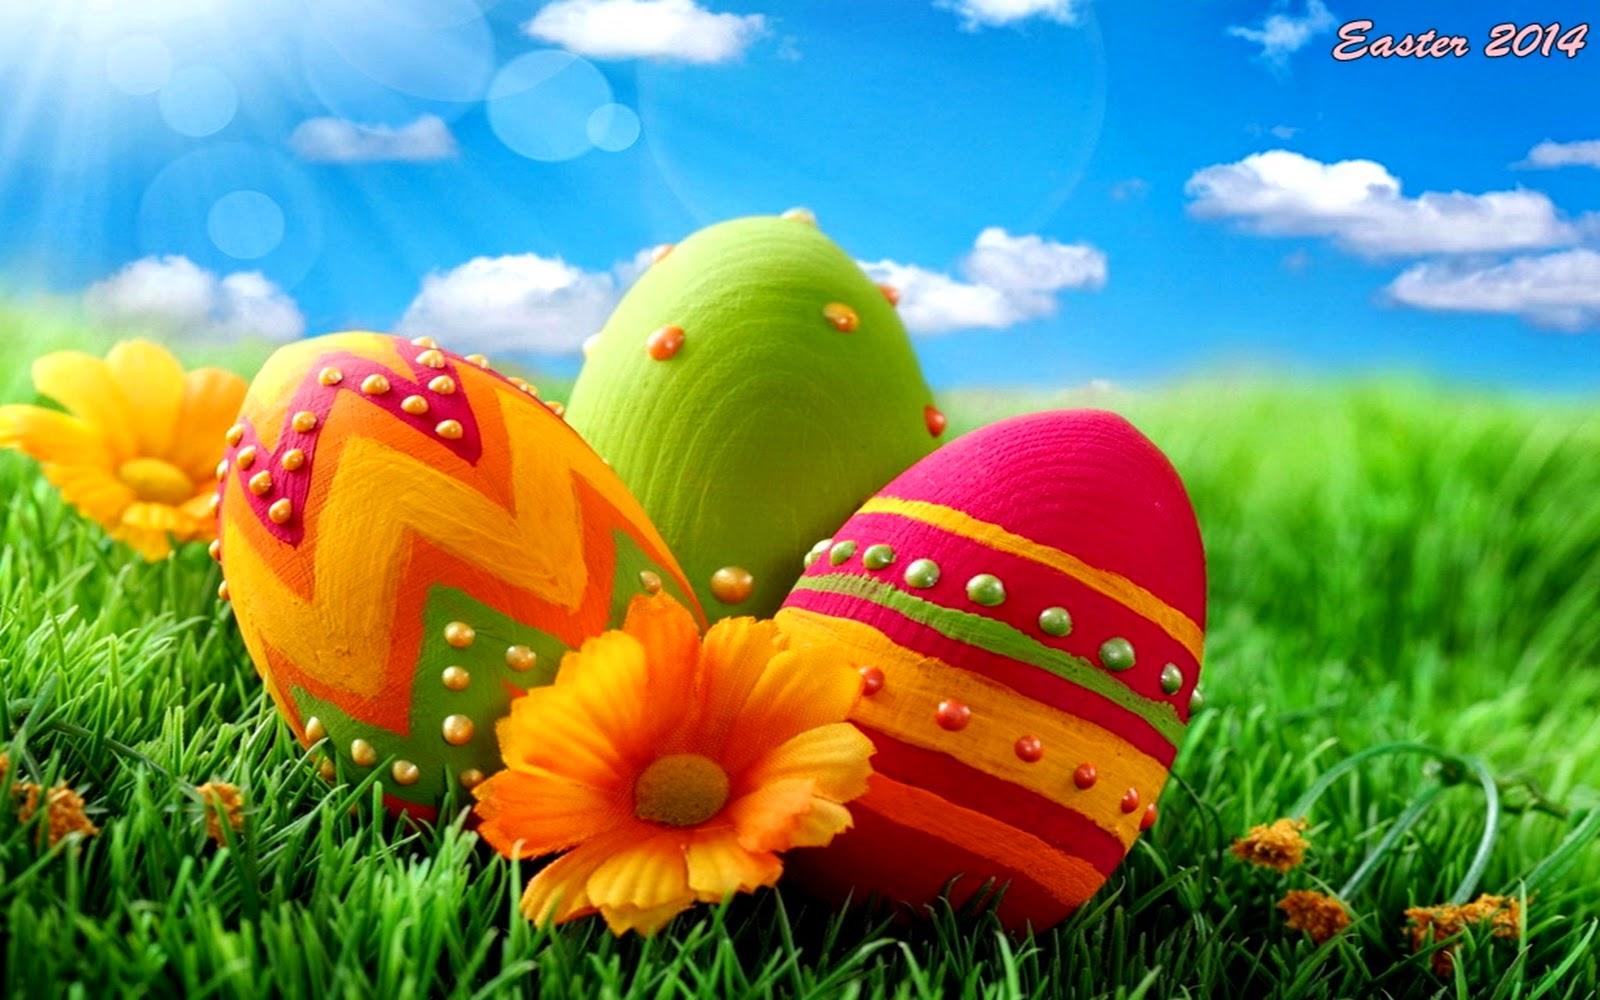 Easter Sunday Beautiful Wallpaper 2014 | Wishing Image ...